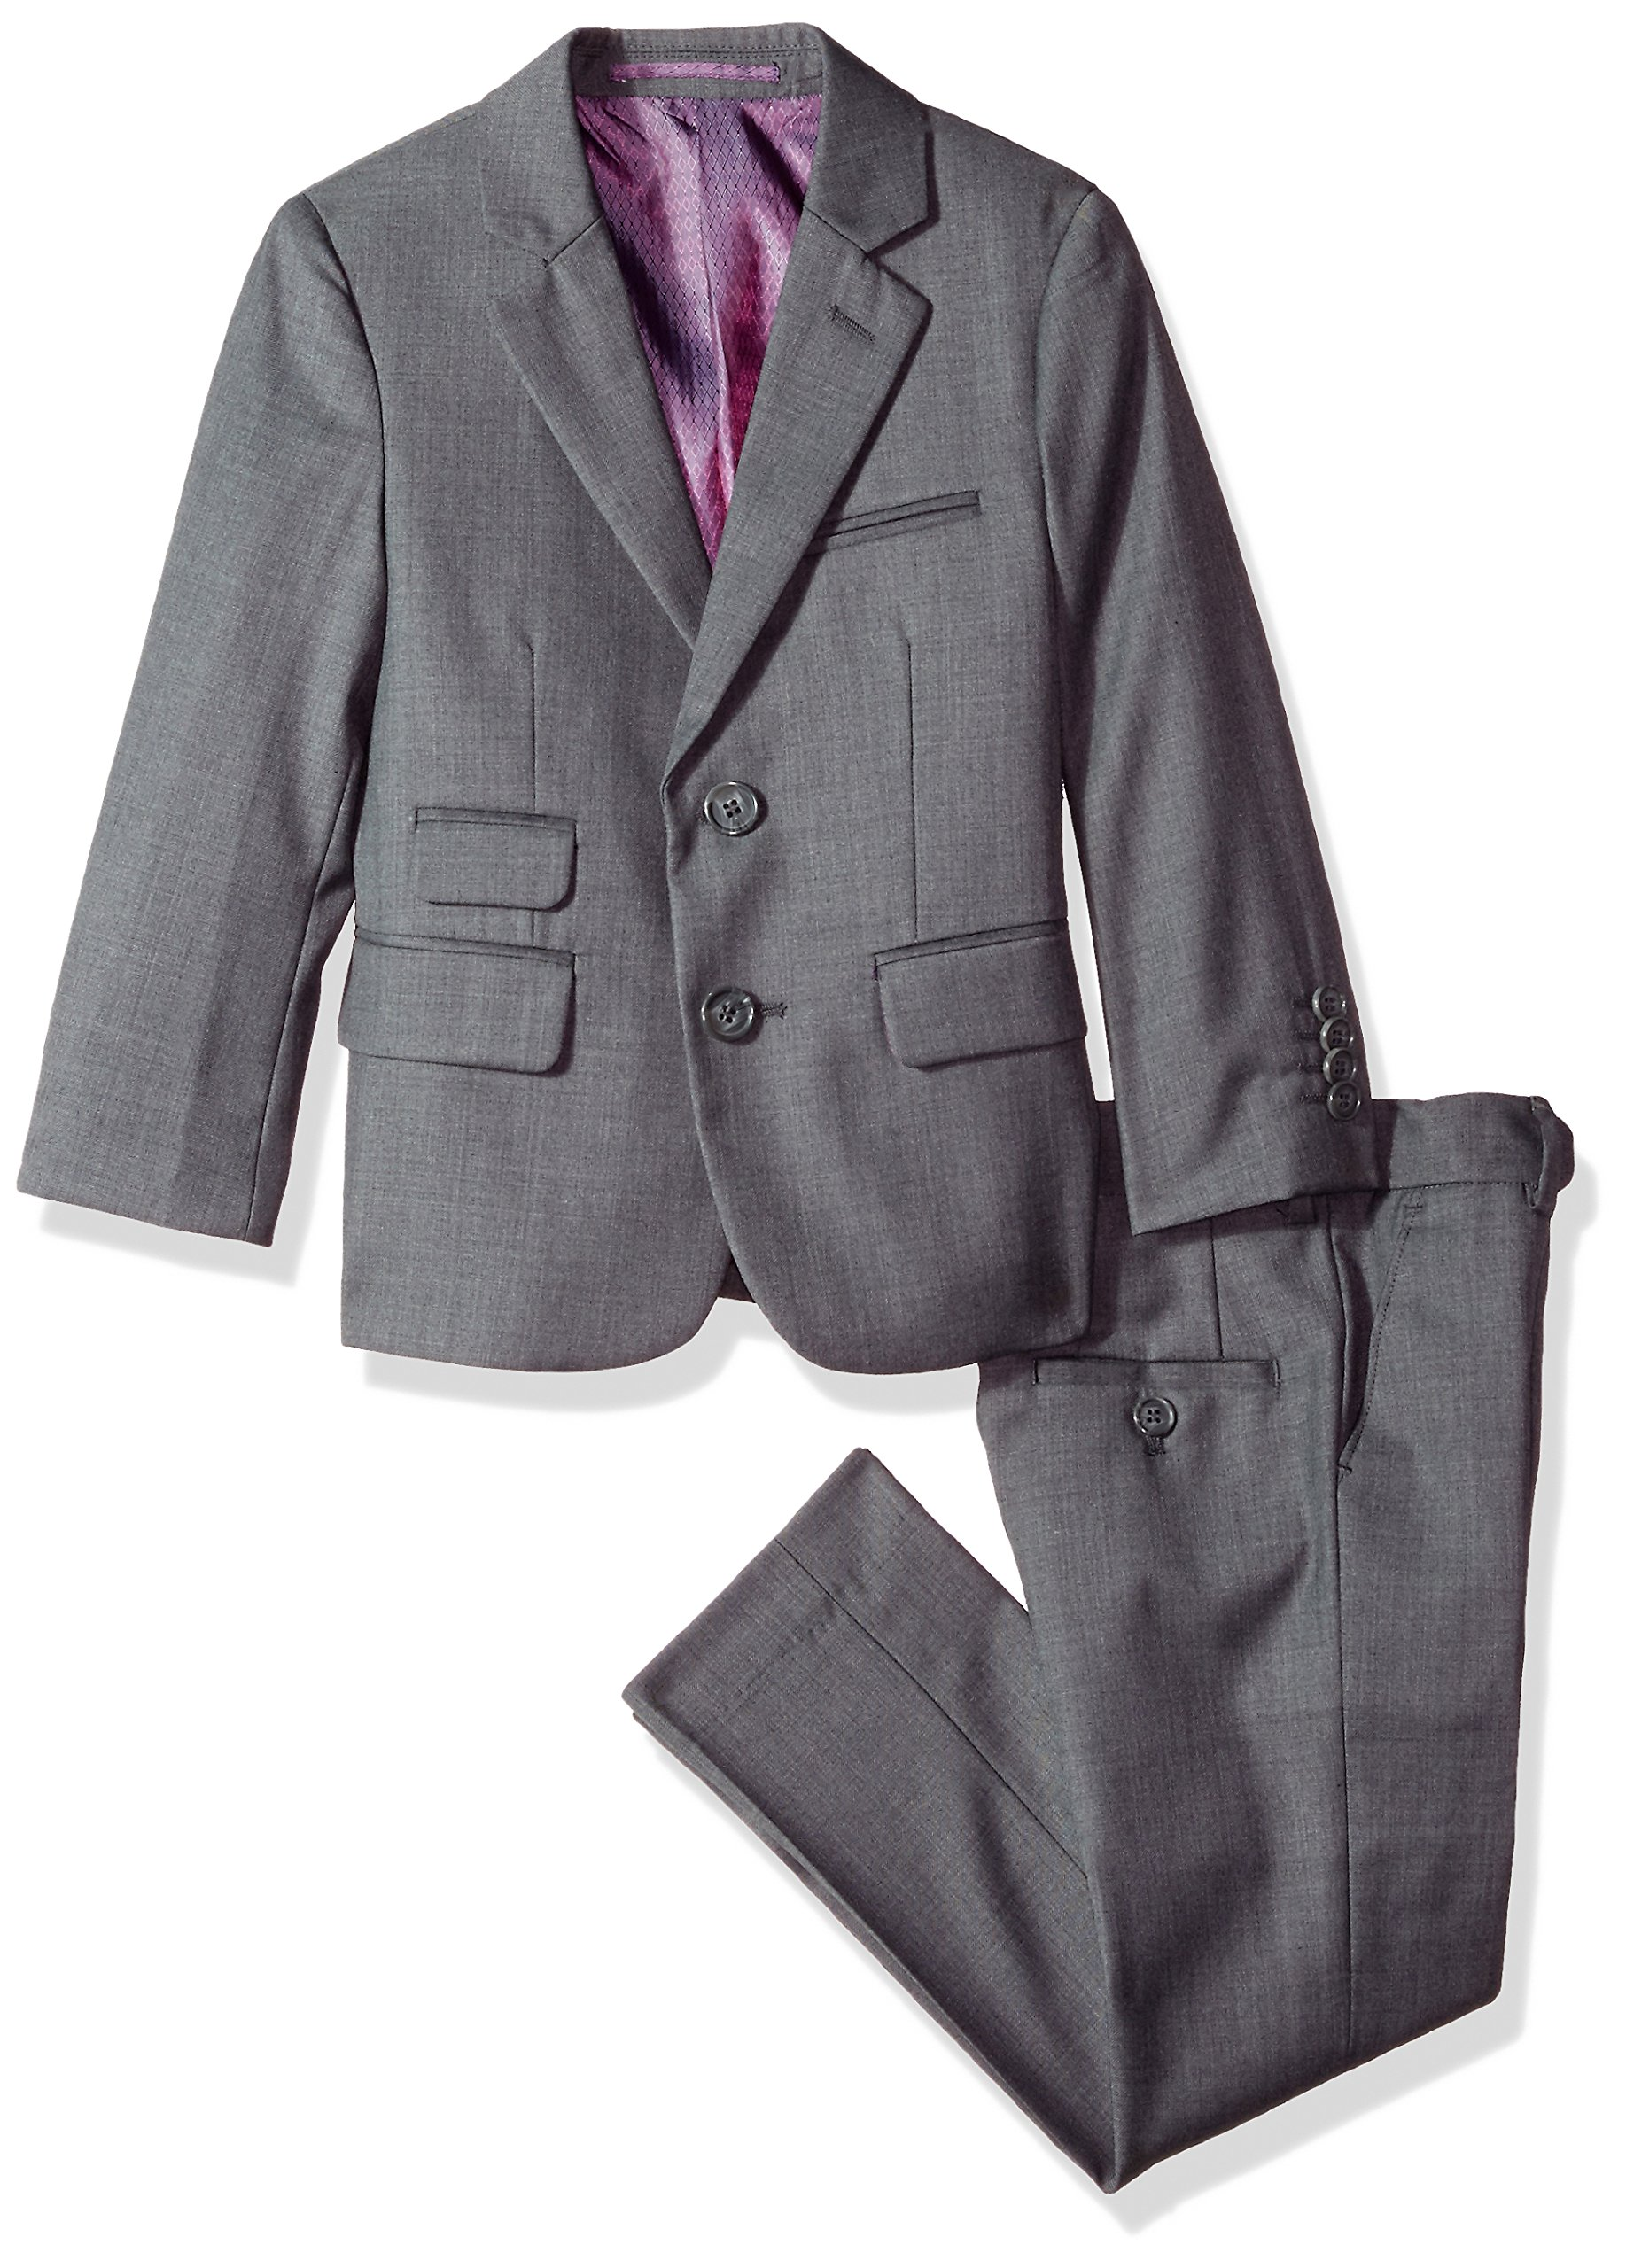 Isaac Mizrahi Little Boys' Solid 2pc Slim Fit Wool Suit, Charcoal, 5 by Isaac Mizrahi